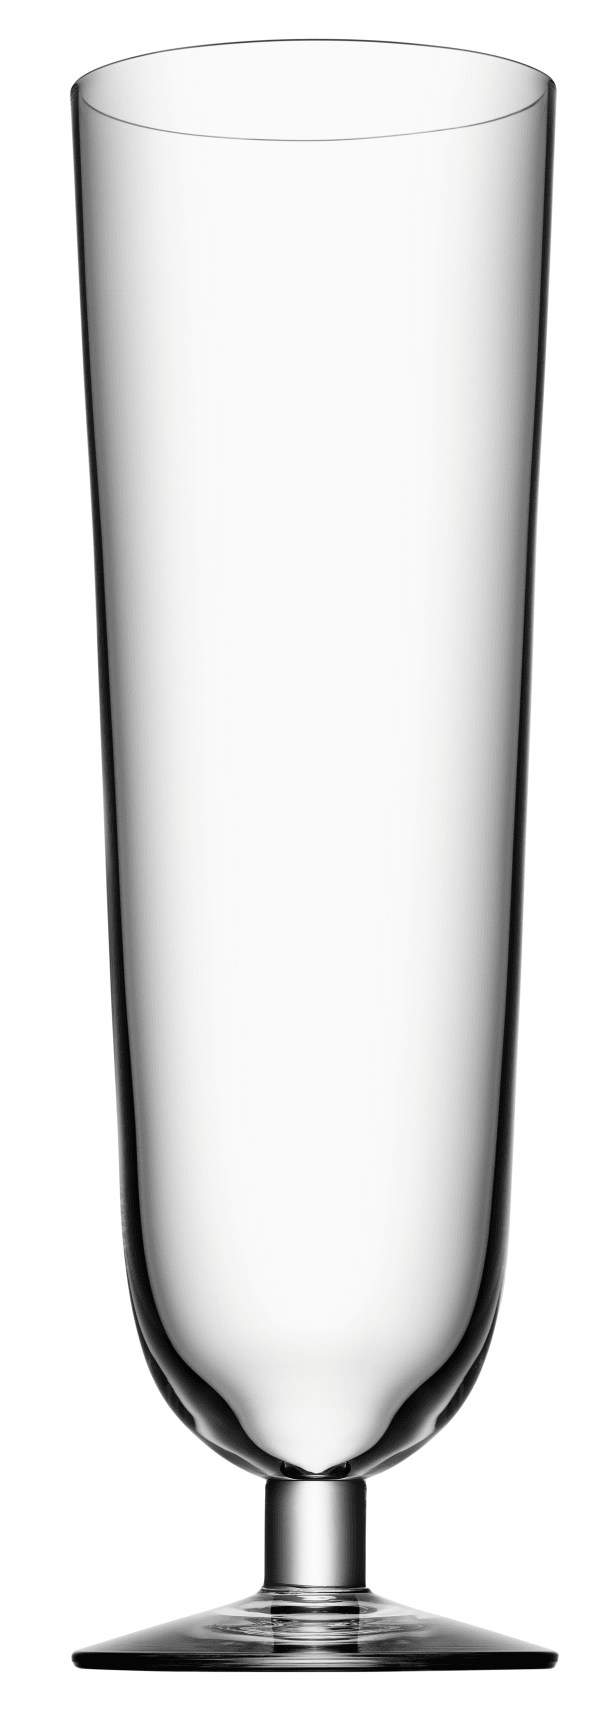 Orrefors Beer Pils glass 4 pcs